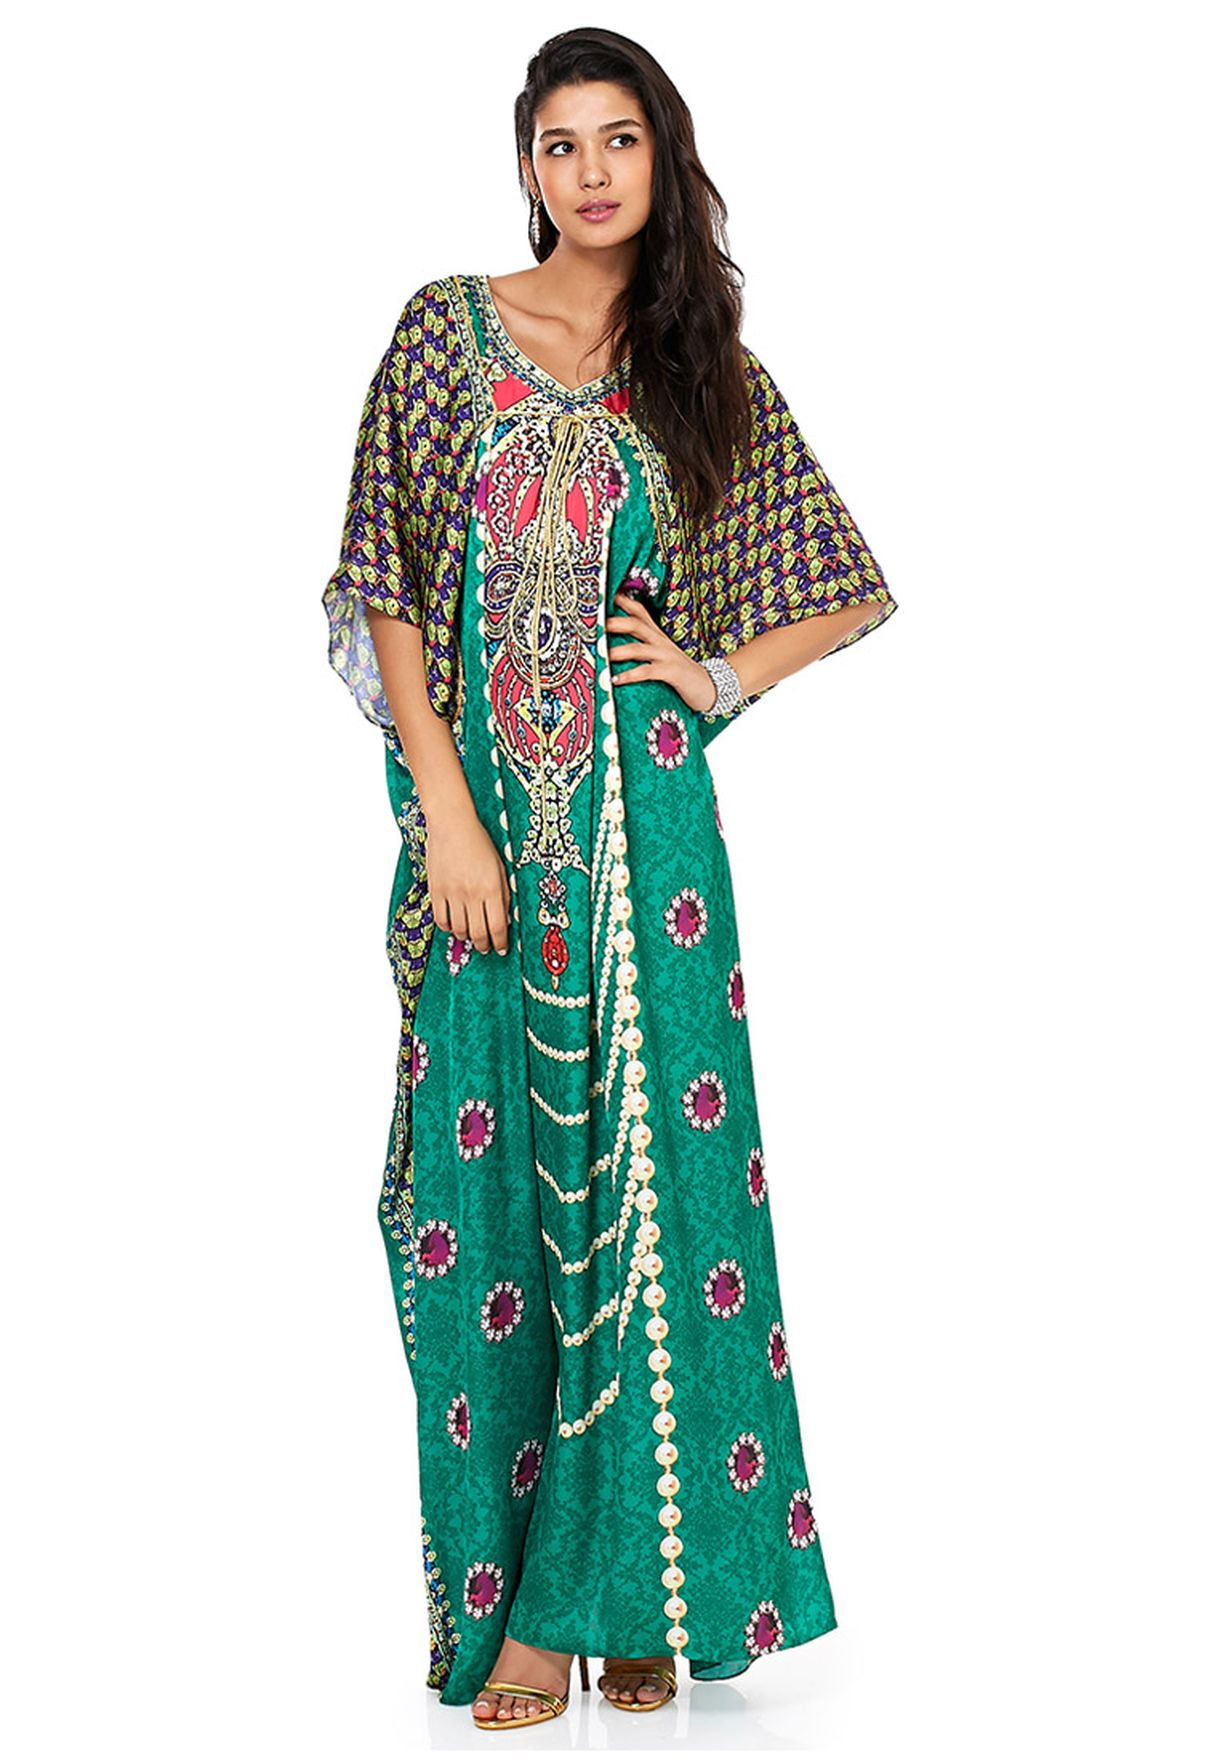 c939b62b0 Shop Aanchal chanda animalprint Jacket Style Kaftan for Women in ...